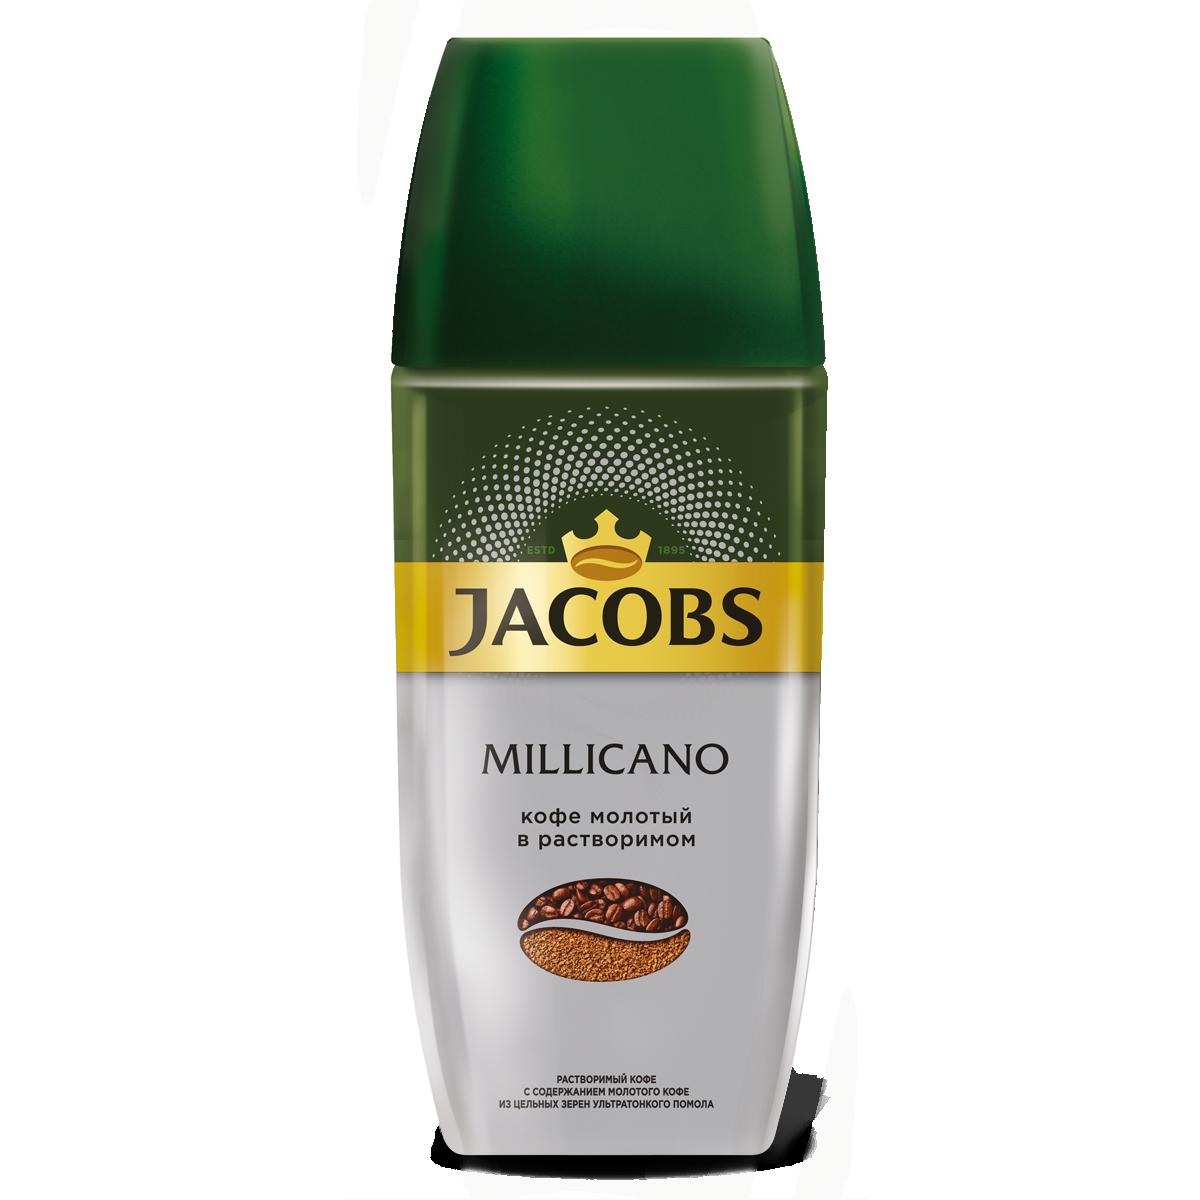 Кофе растворимый Jacobs monarch millicano 95 г